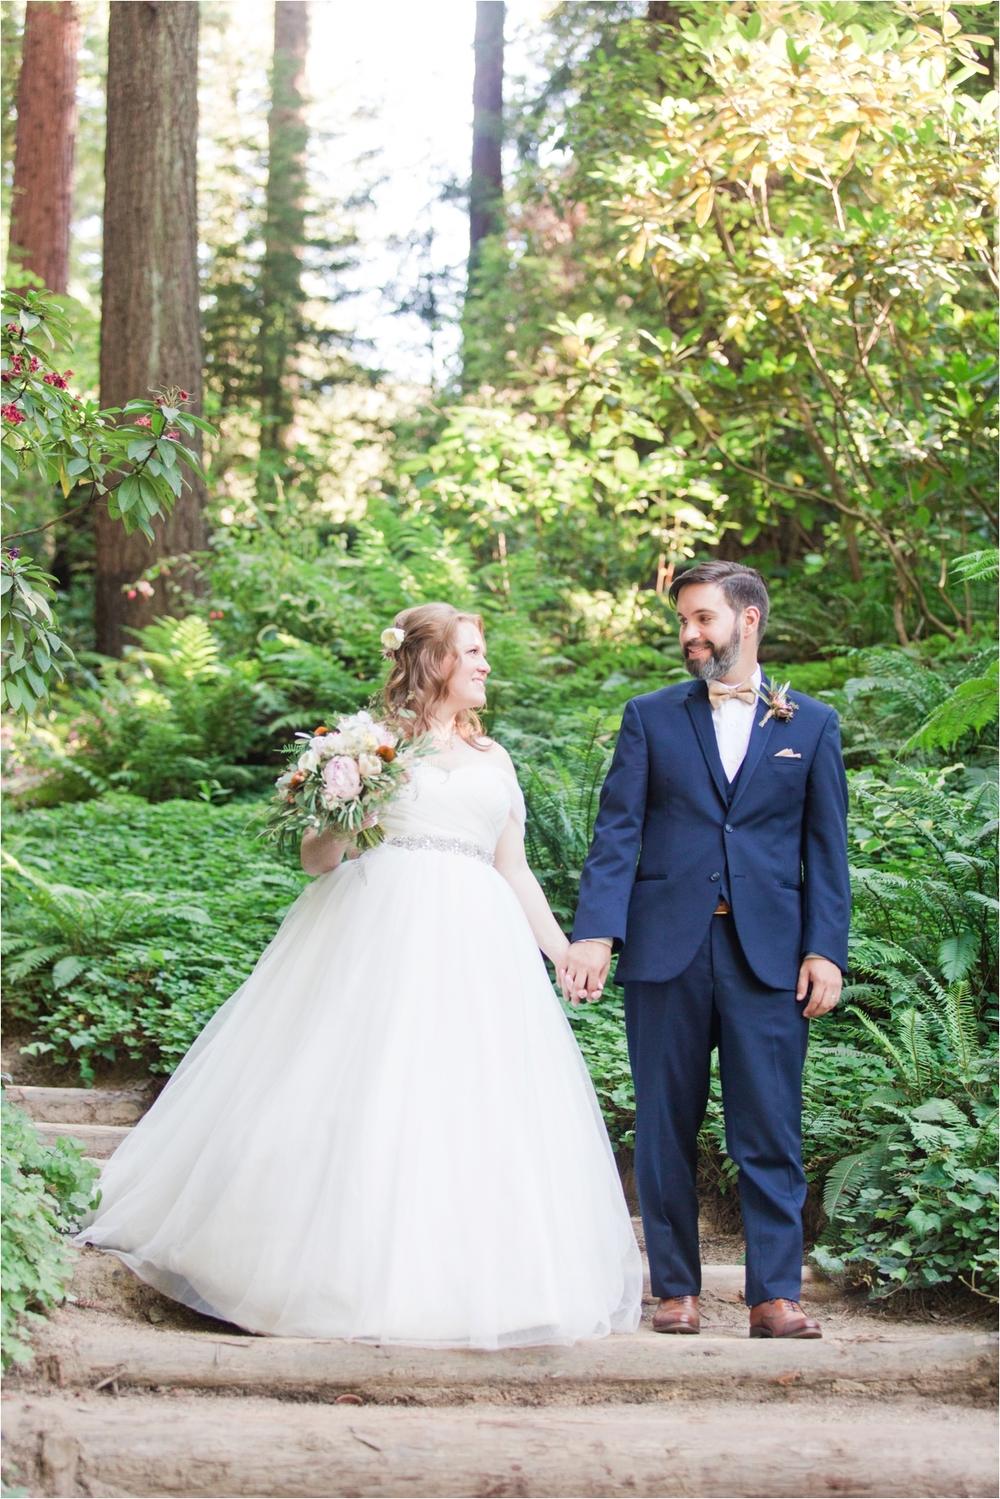 Nestldown wedding Photos by Briana Calderon Photography_0153.jpg